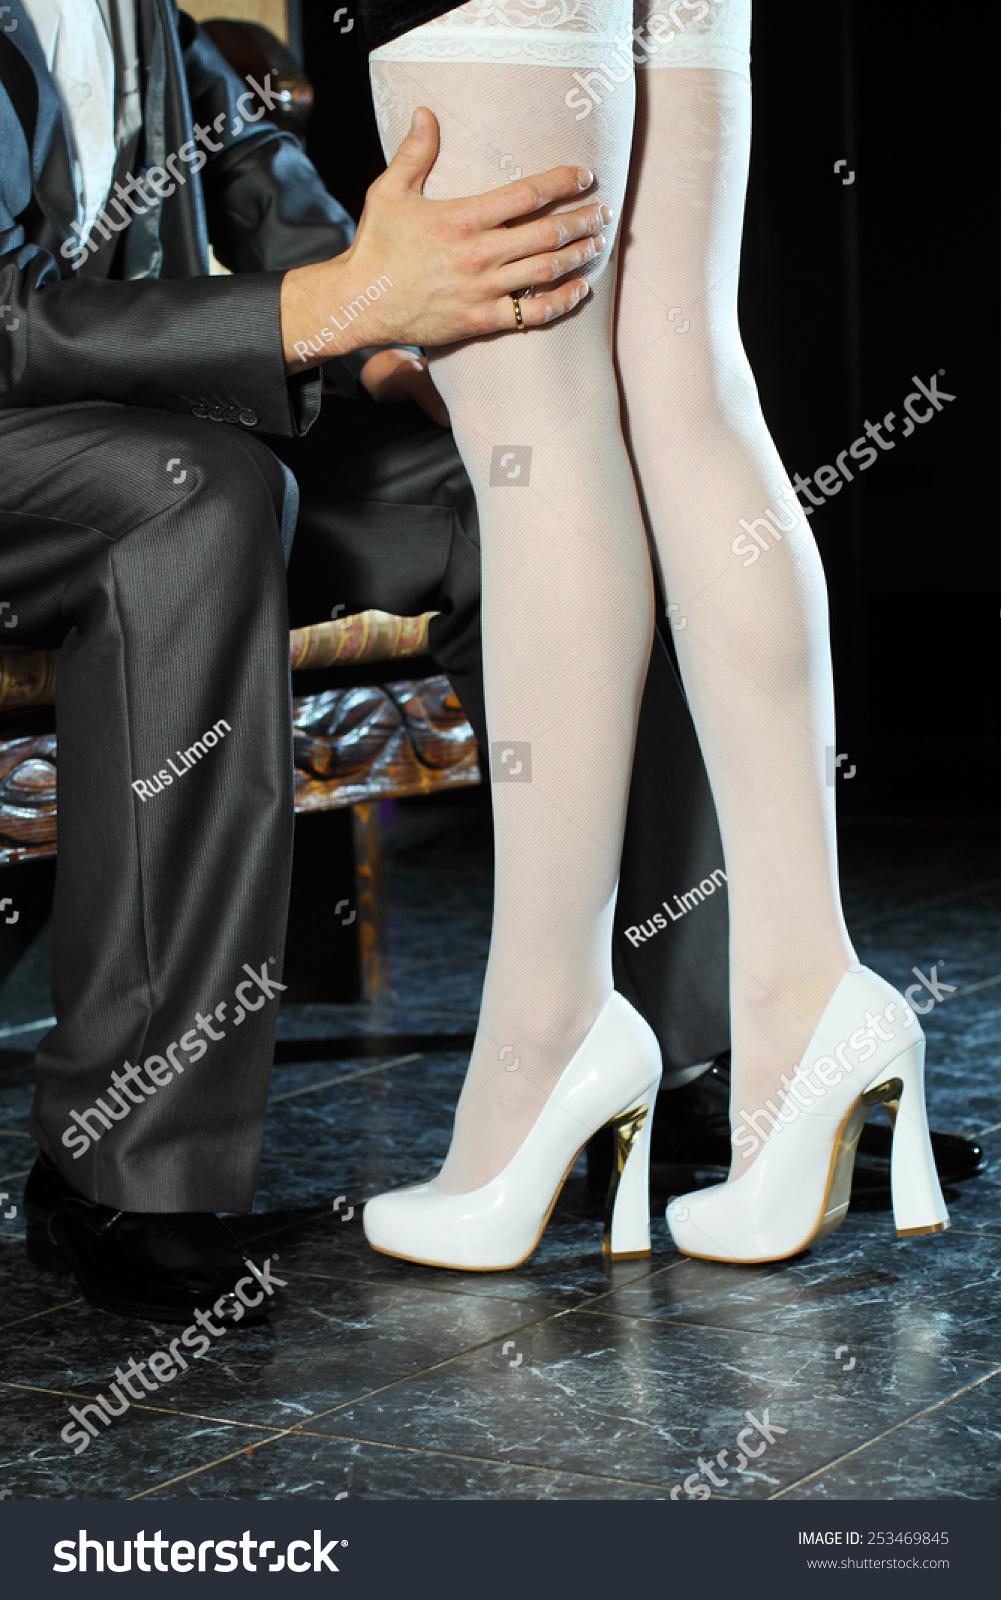 Girl White Stockings Seduces Man Indoors Stock Photo 253469845 - Shutterstock-3028